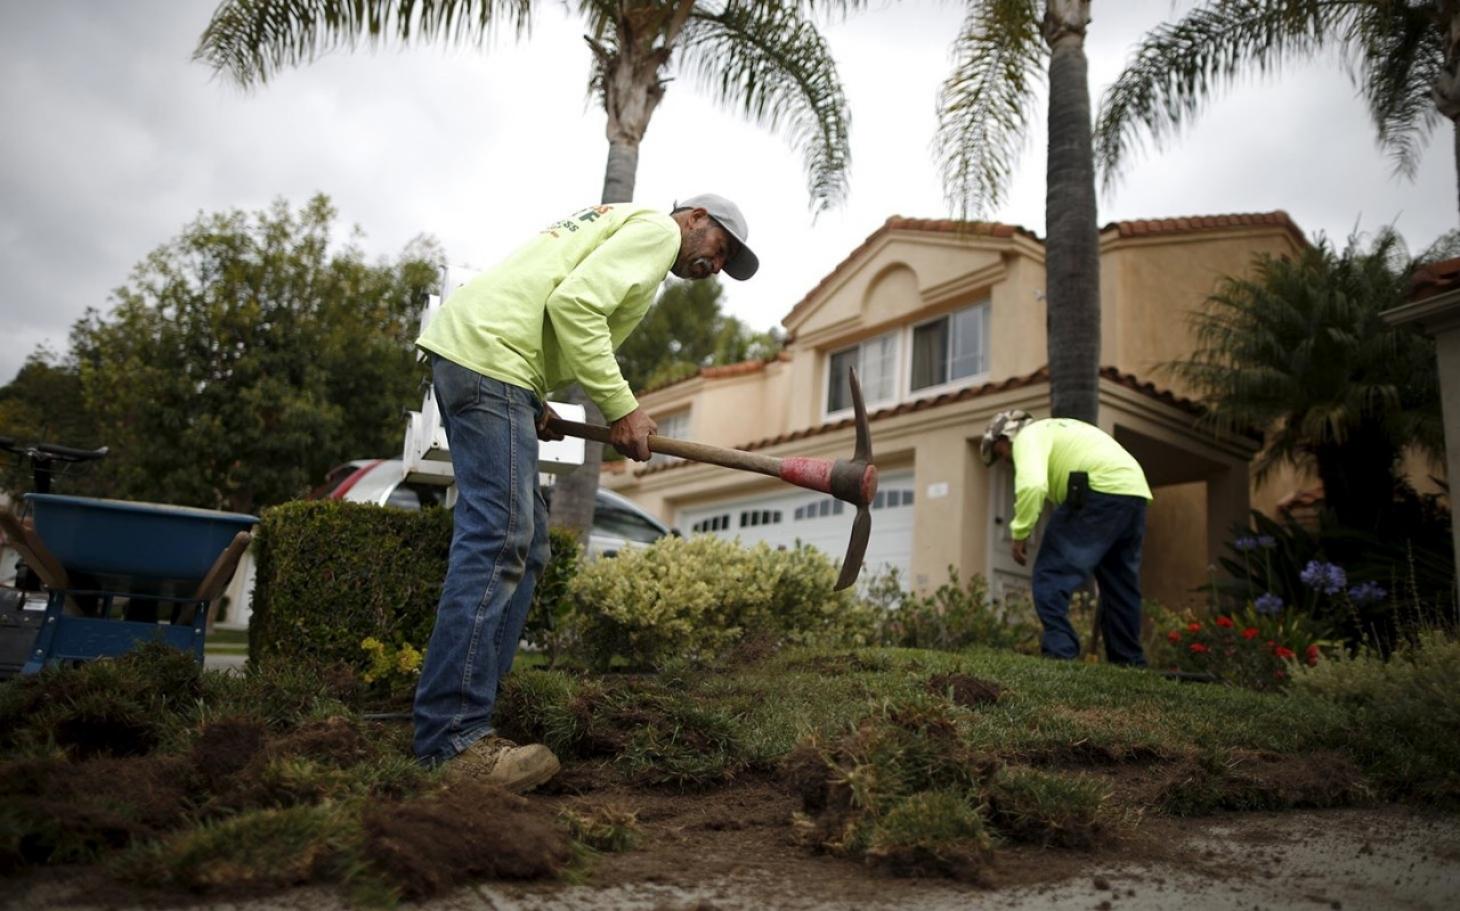 California Gardeners Lose Work During Drought Al Jazeera